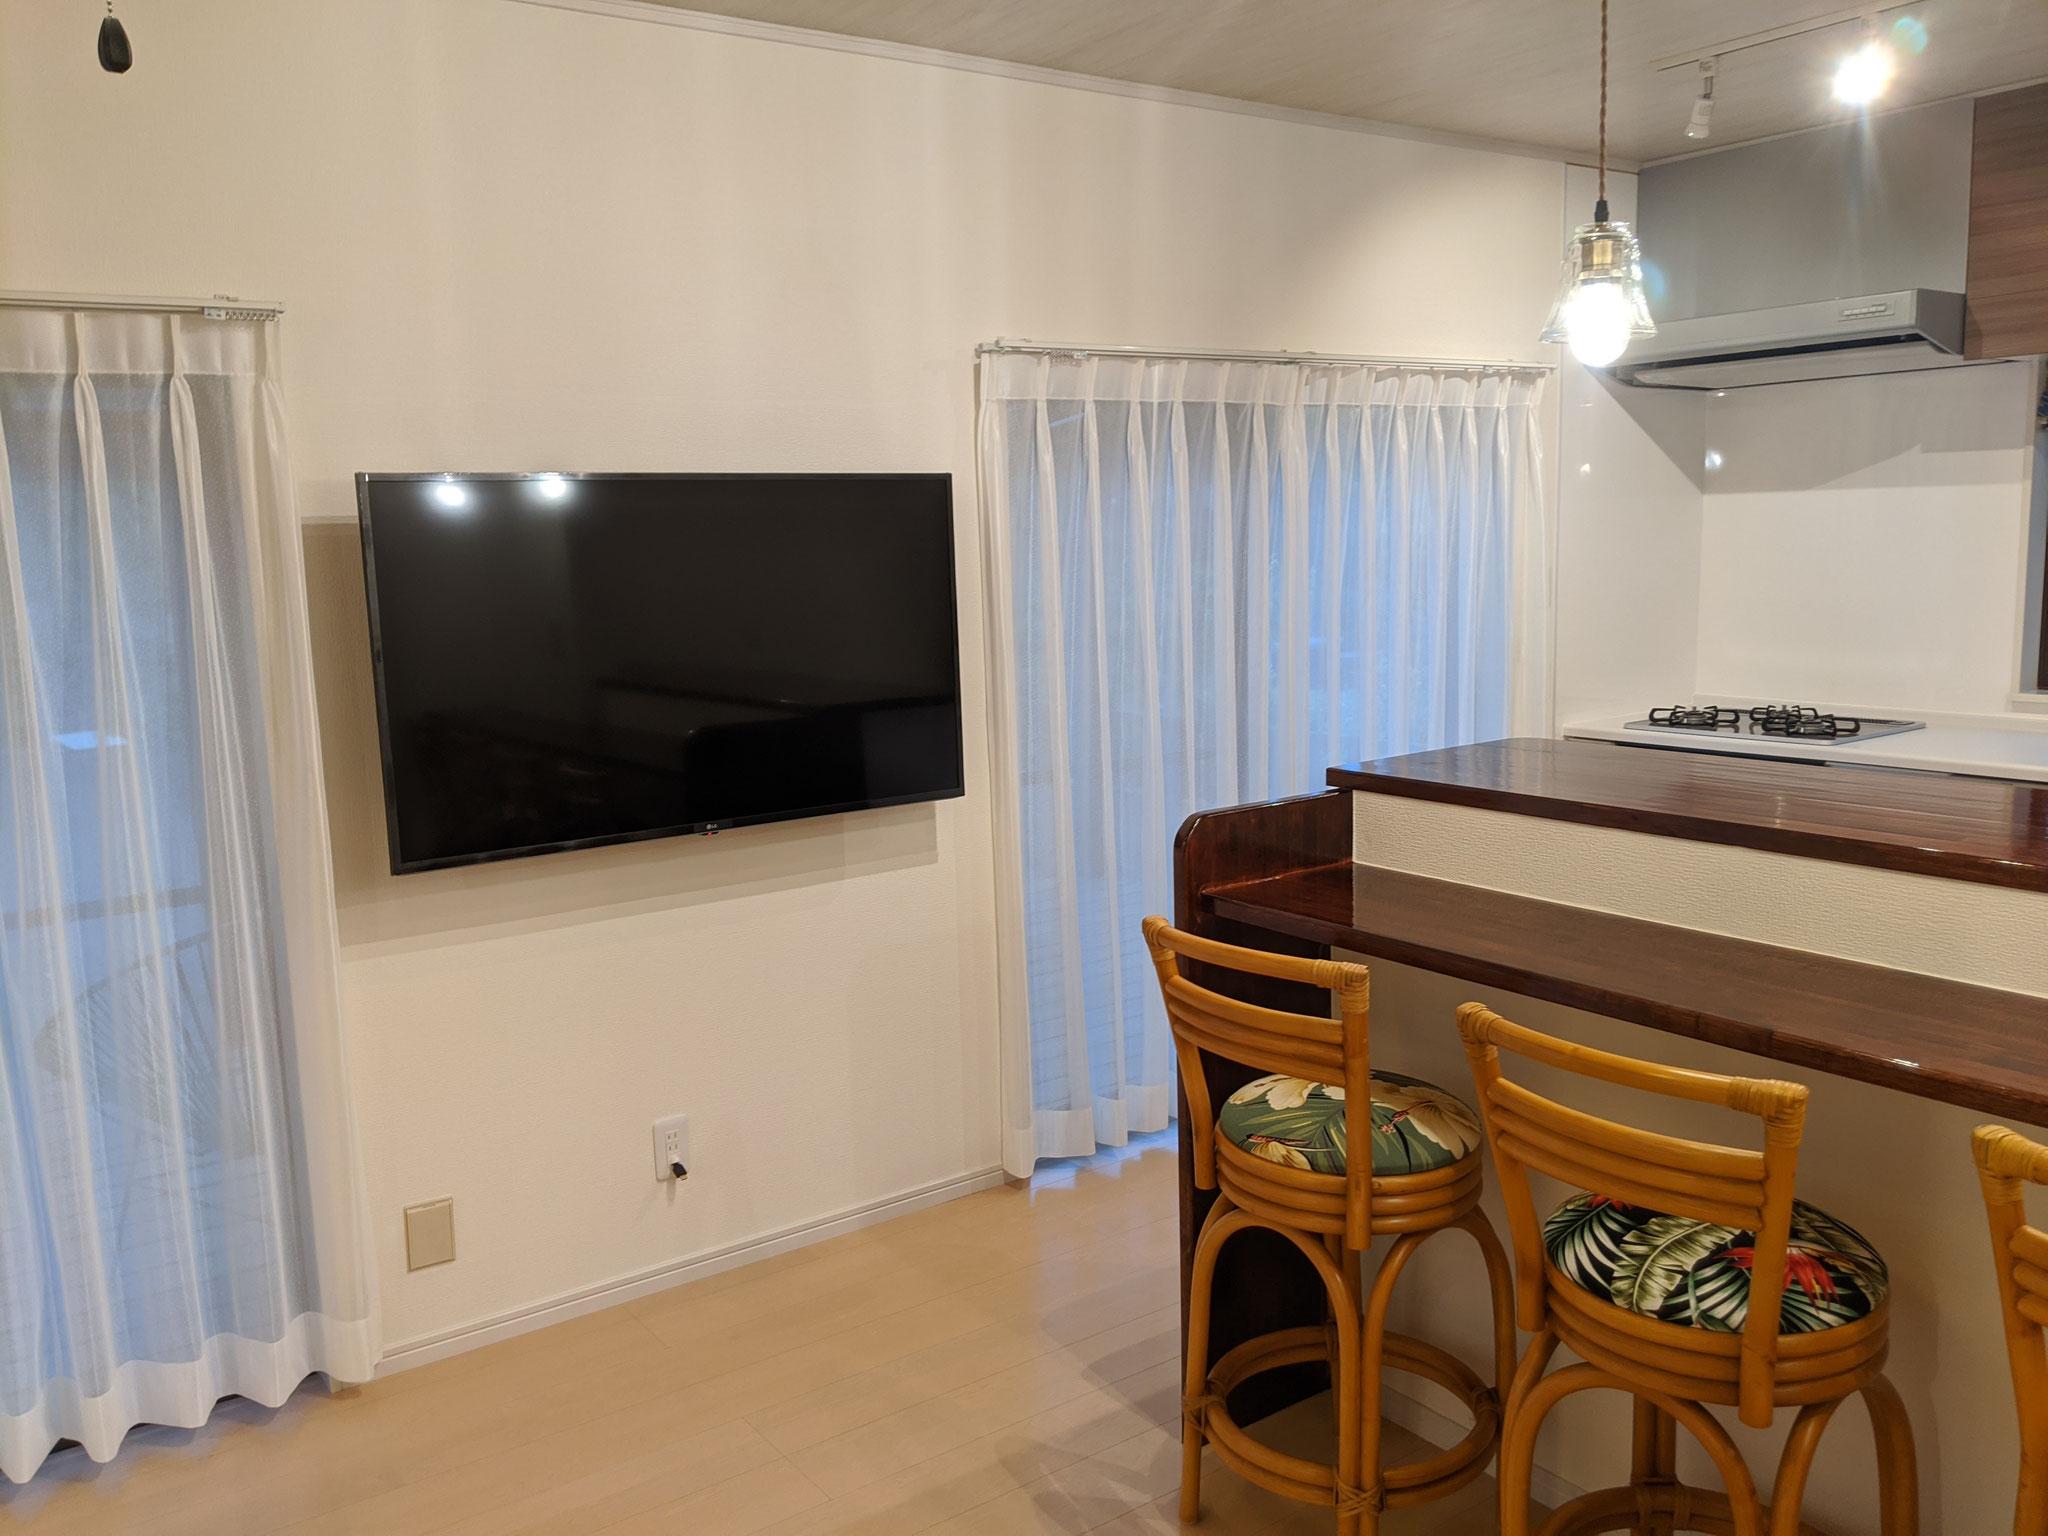 LG50インチ4Kテレビ